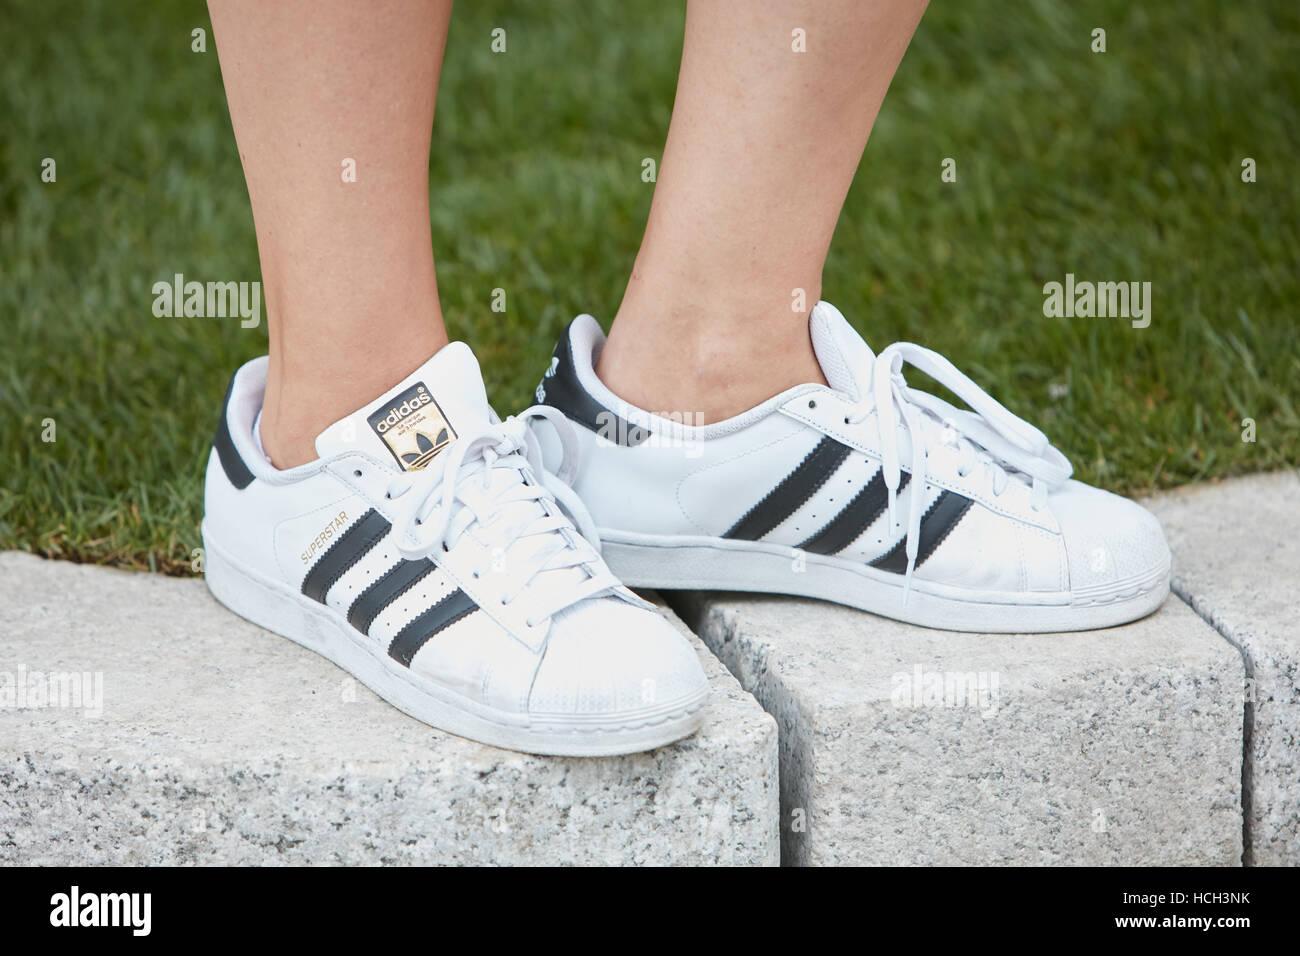 adidas superstar style donna